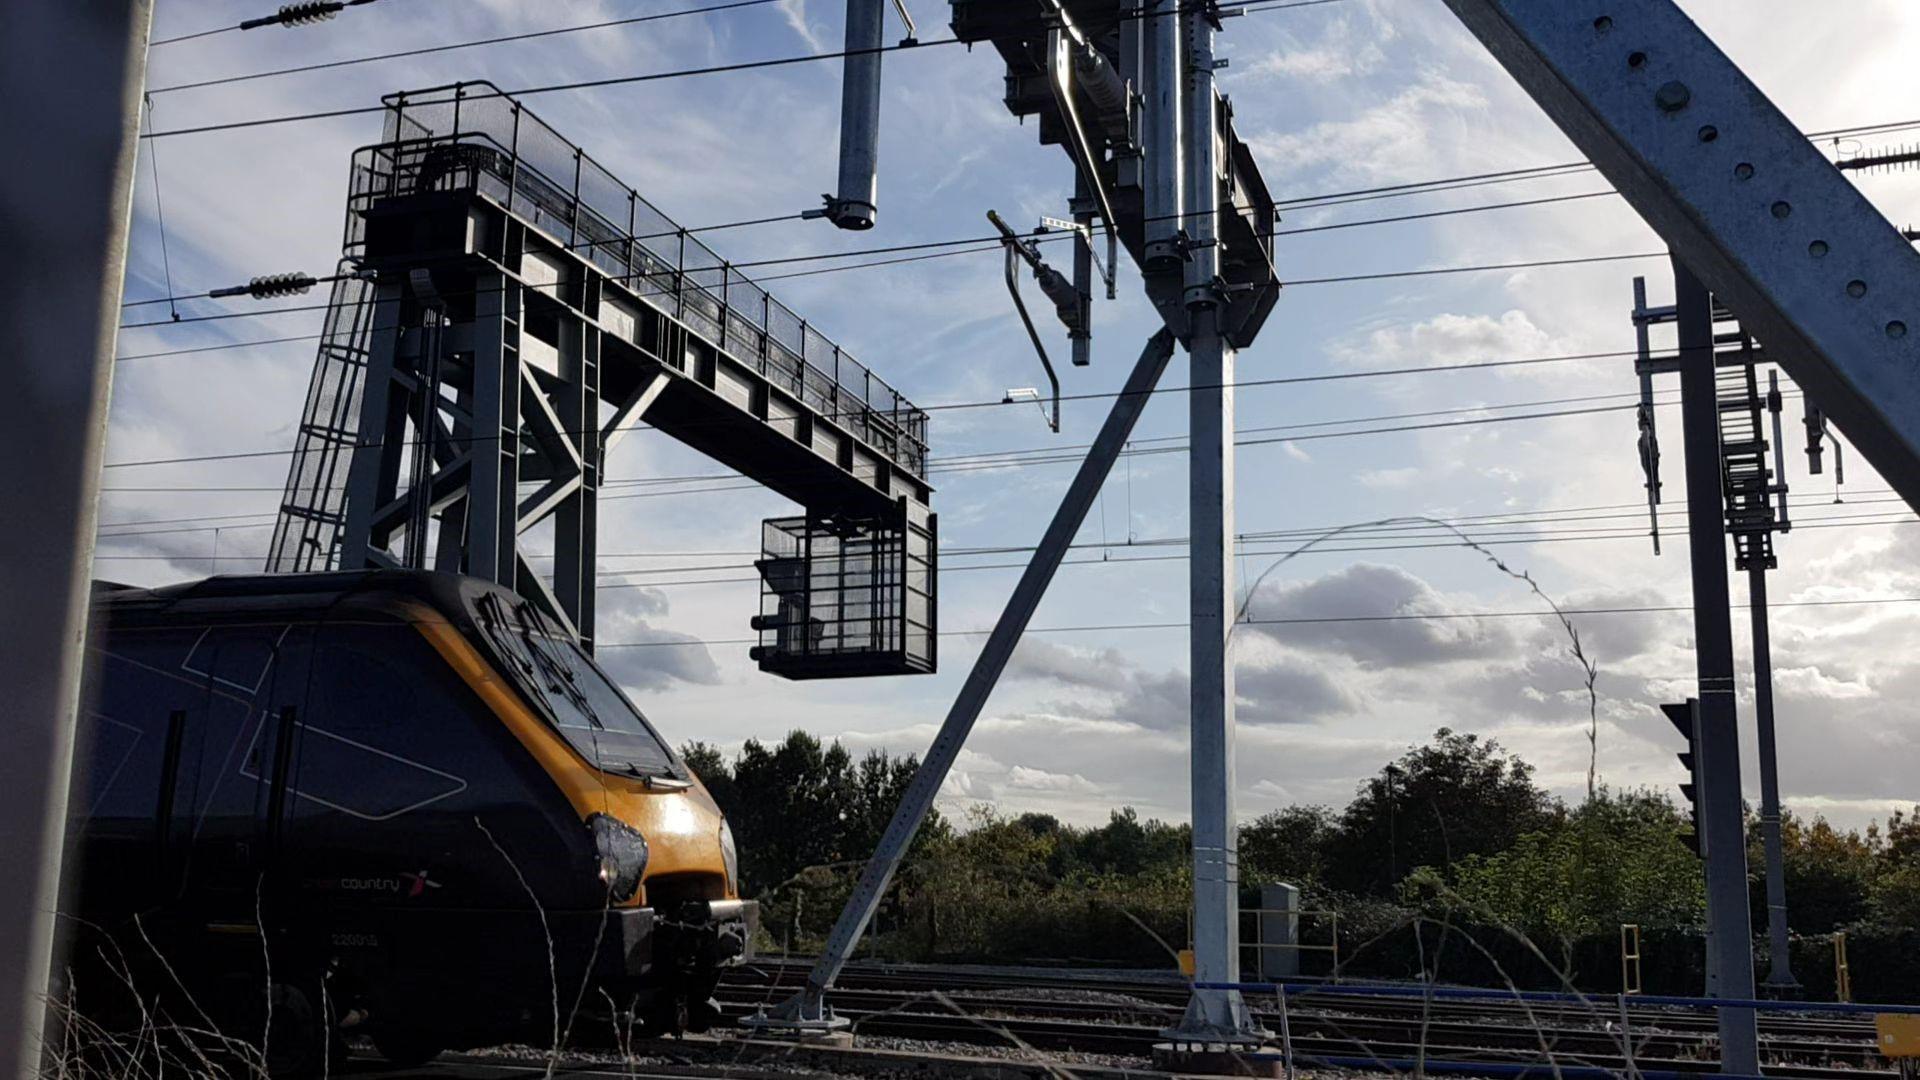 signalling equipment at Bristol